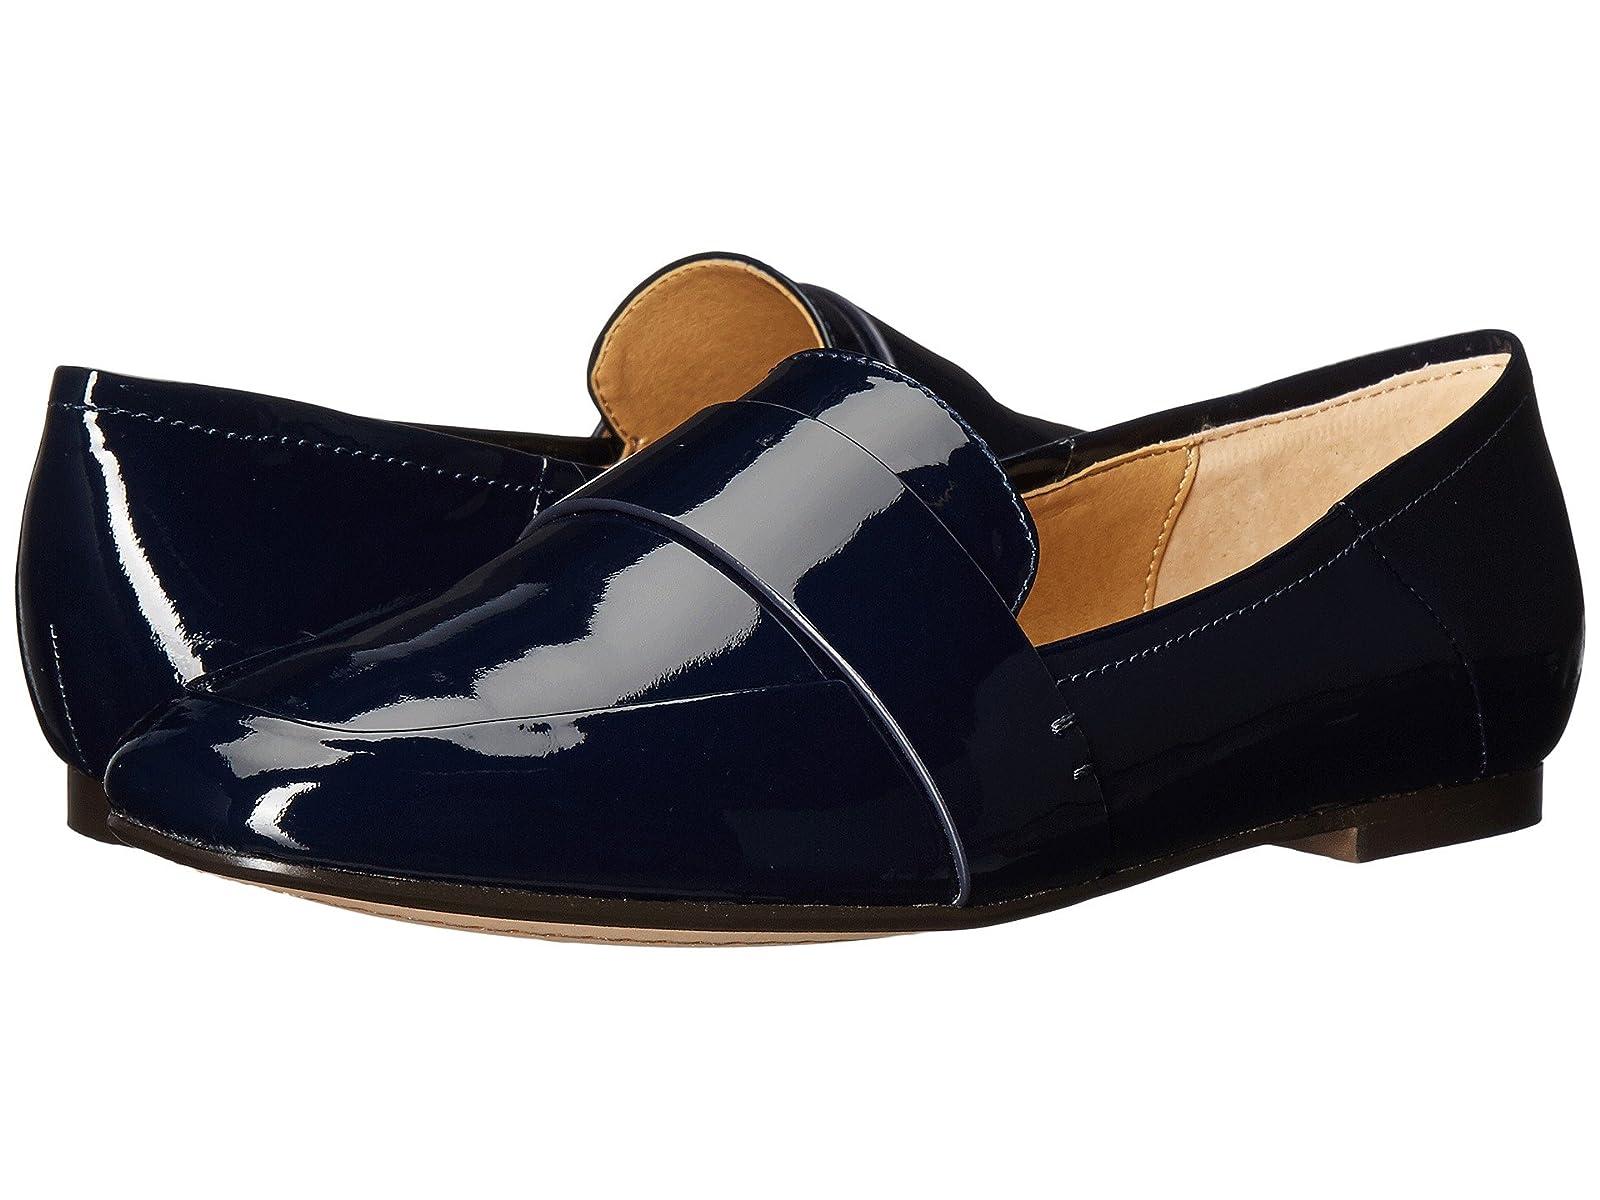 Splendid DeltaCheap and distinctive eye-catching shoes